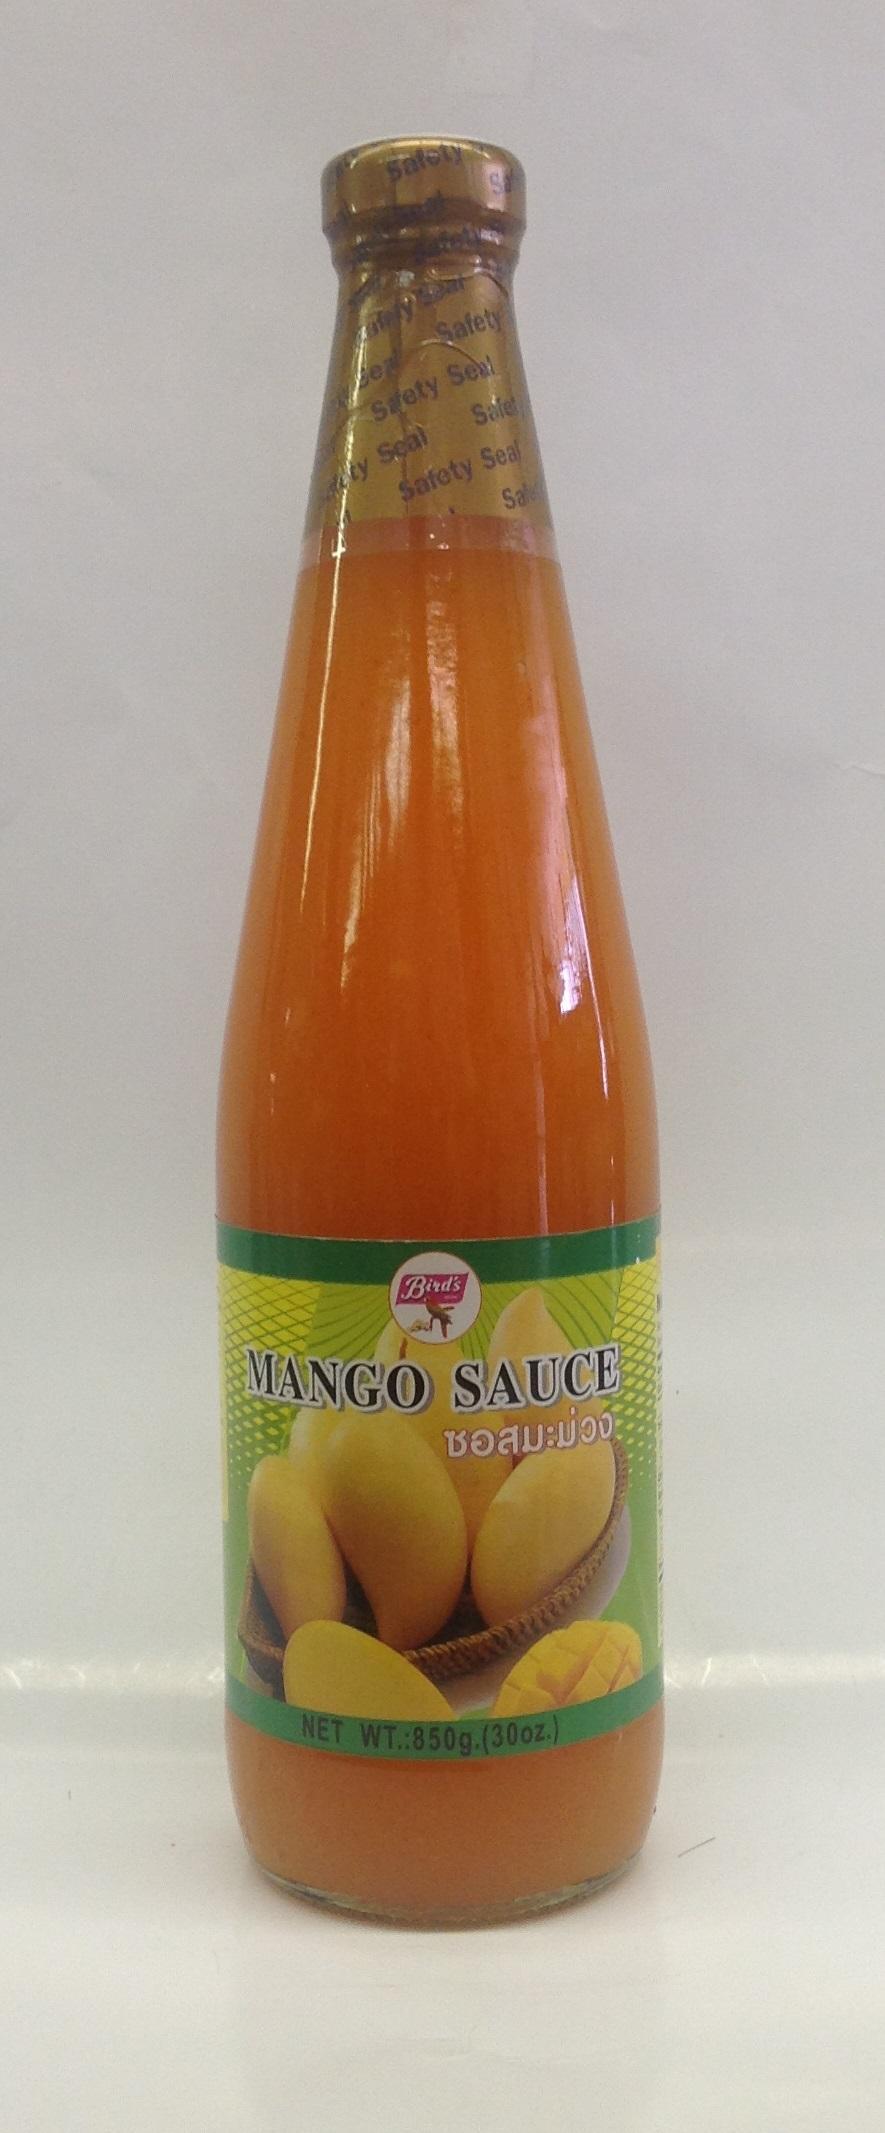 Mango Sauce   Bird's   SA14200 12x30 oz